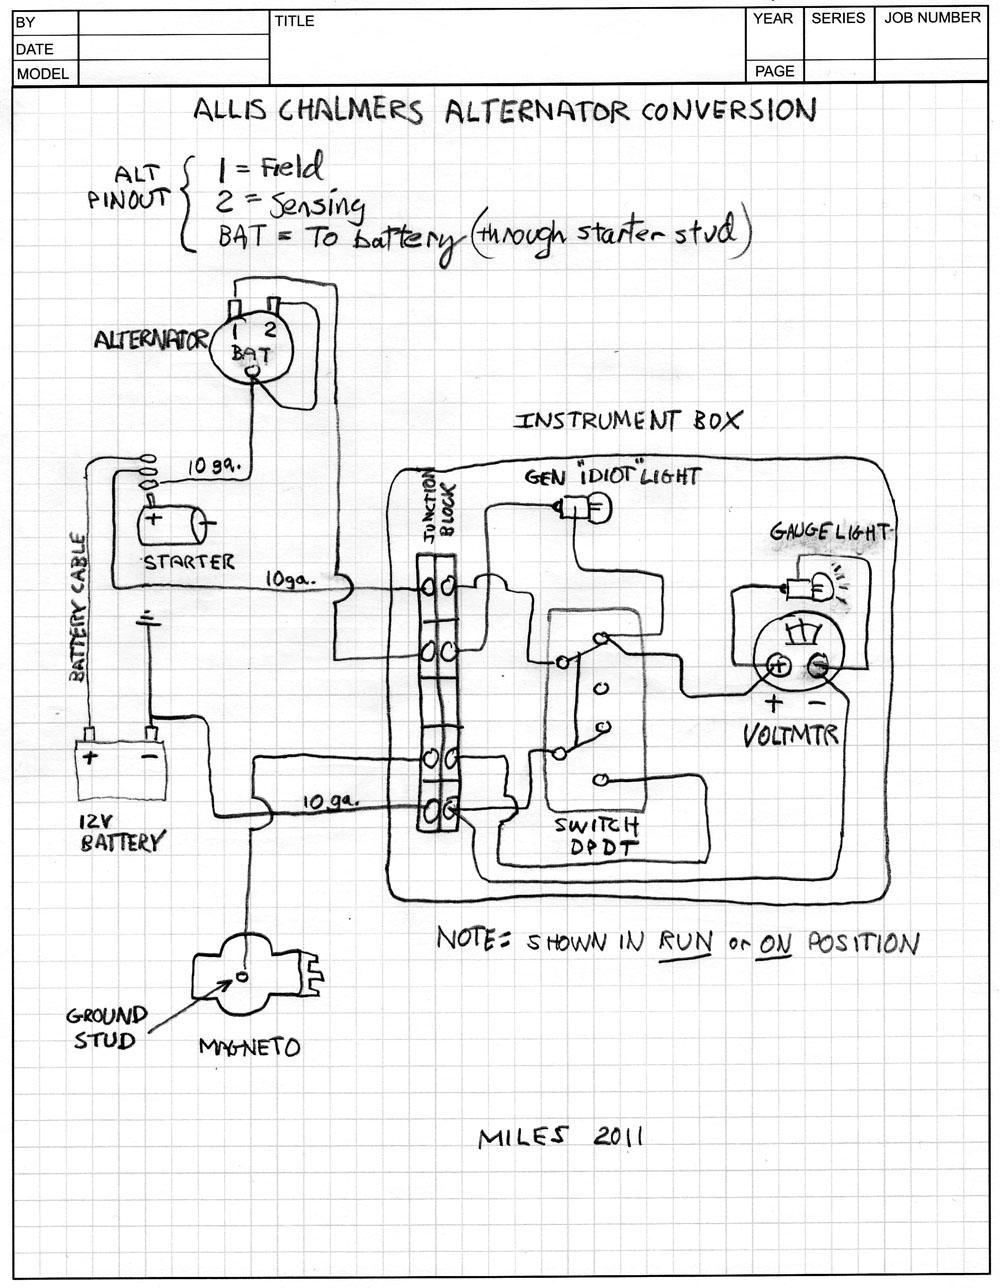 Squid's Fab Shop Allis Chalmers B Alternator Conversion. Allis Chalmers B Alternator Conversion Schematic. Wiring. Electrical Wiring Diagram Allis Chalmers At Scoala.co